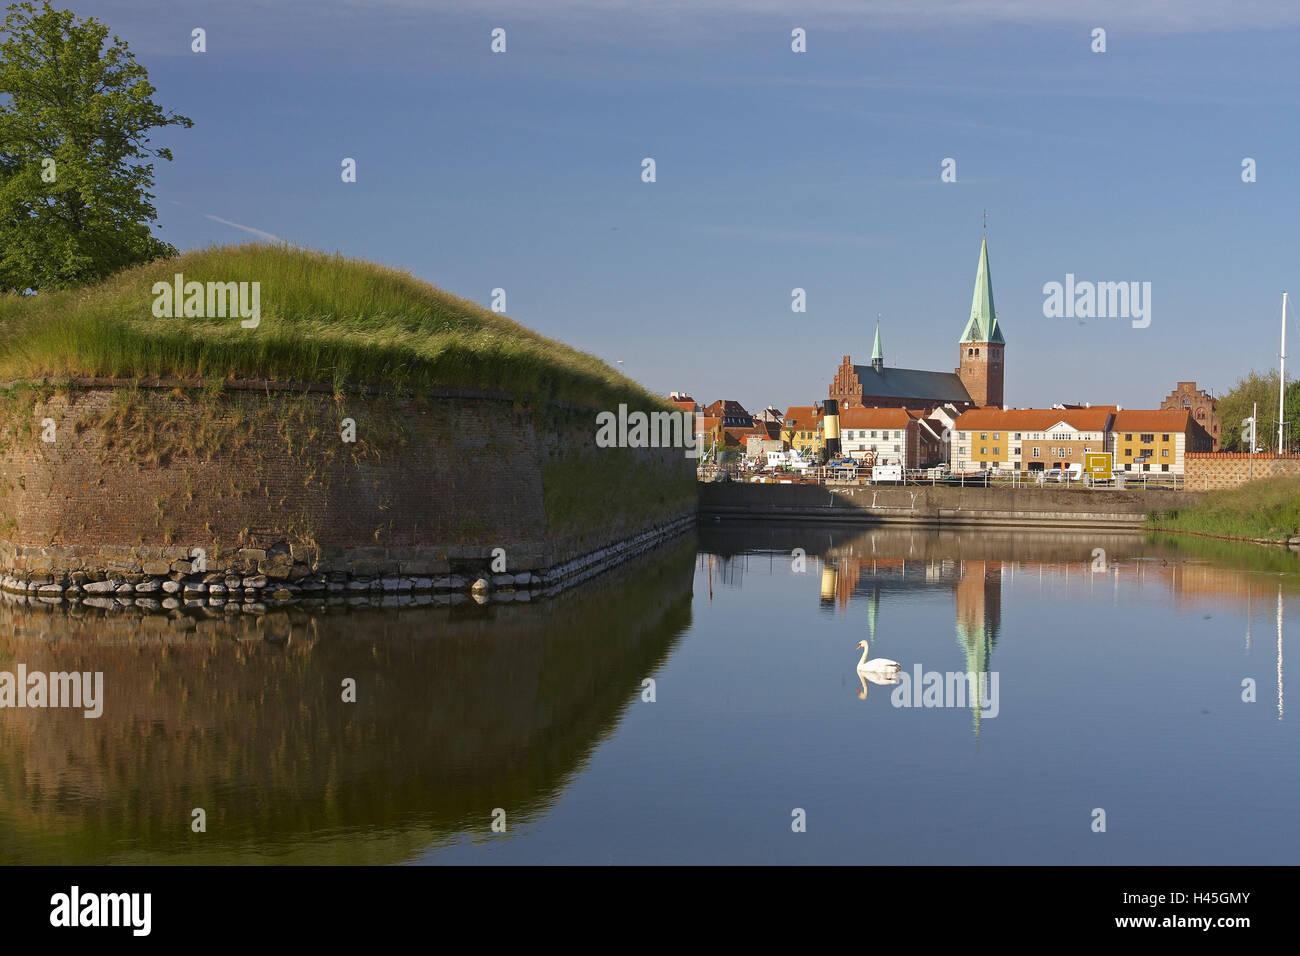 Denmark, Helsingoer, fortress, swan, water jump, townscape, Nikolaikirche, - Stock Image